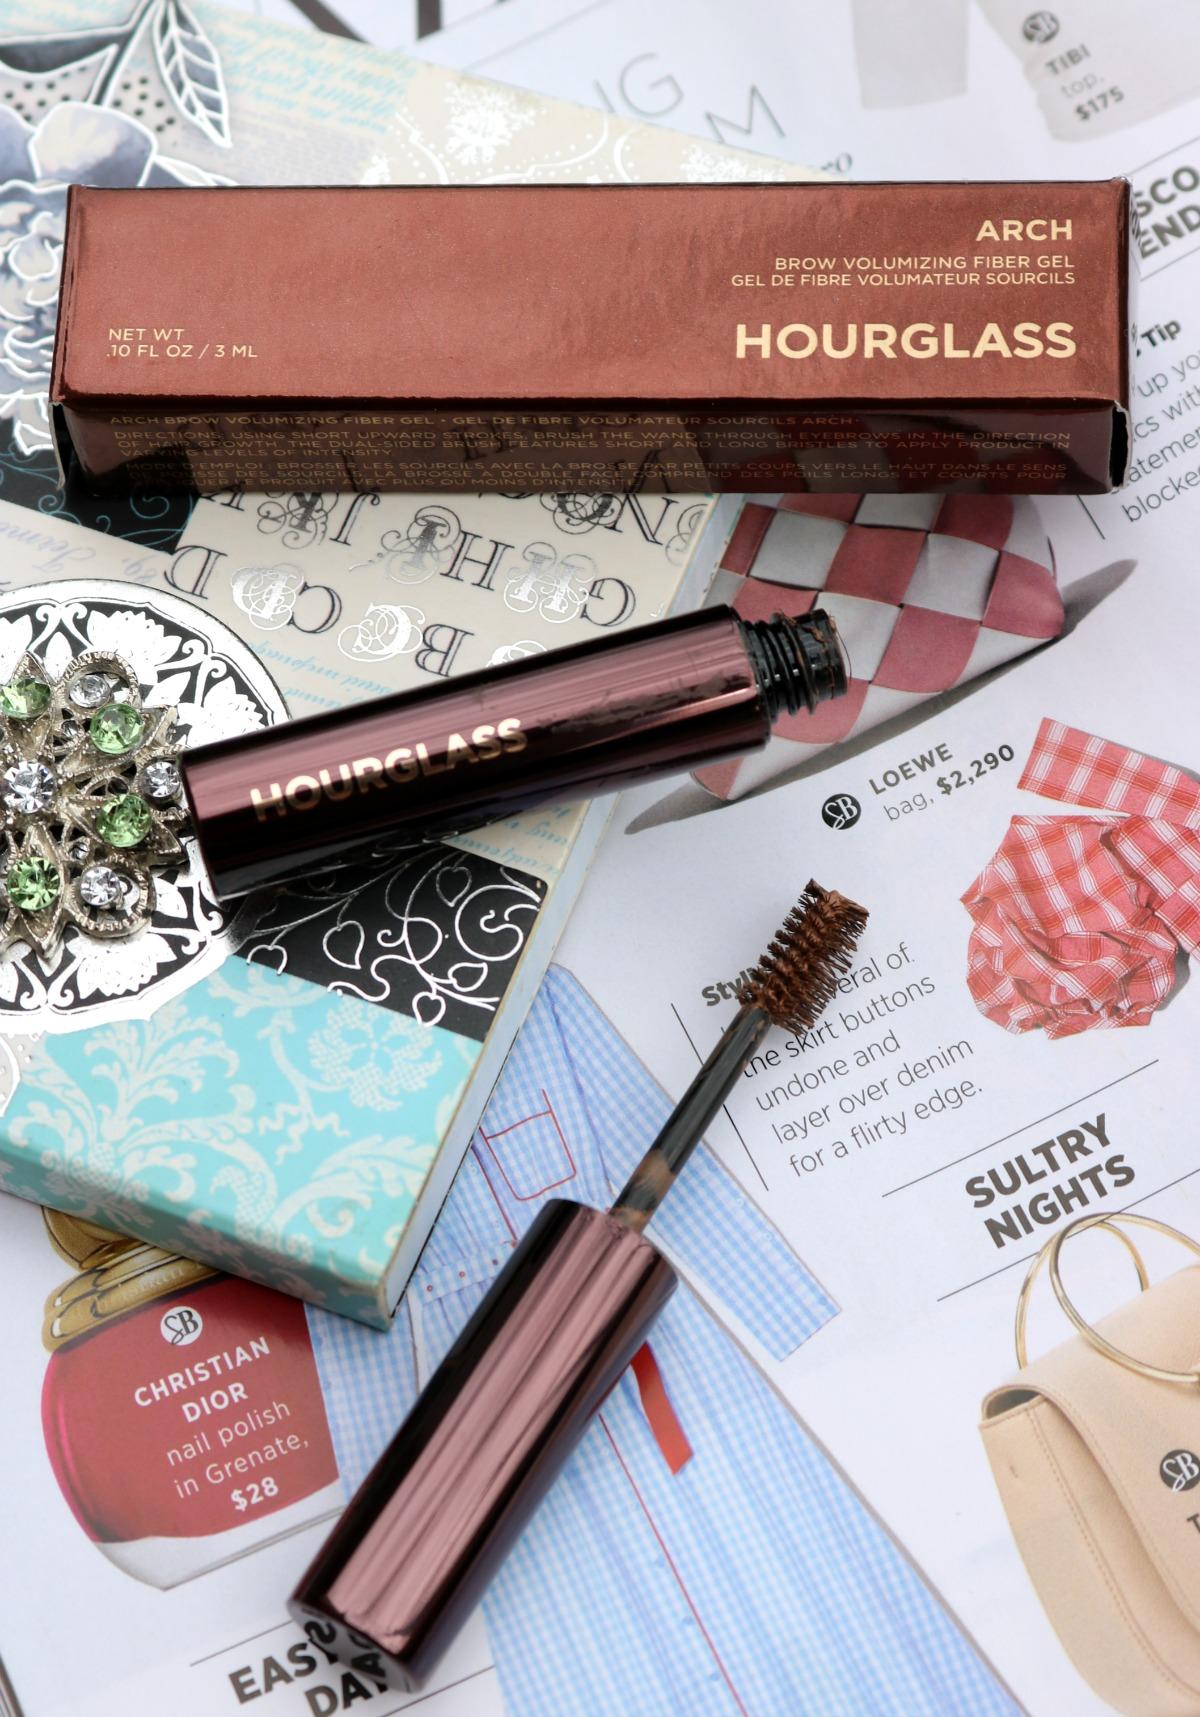 Most Popular Blog Posts of 2018 I Houglass Arch Brow Gel Review I Voluminizing Fiber Eyebrow Gel #CrueltyFree #Eyebrows